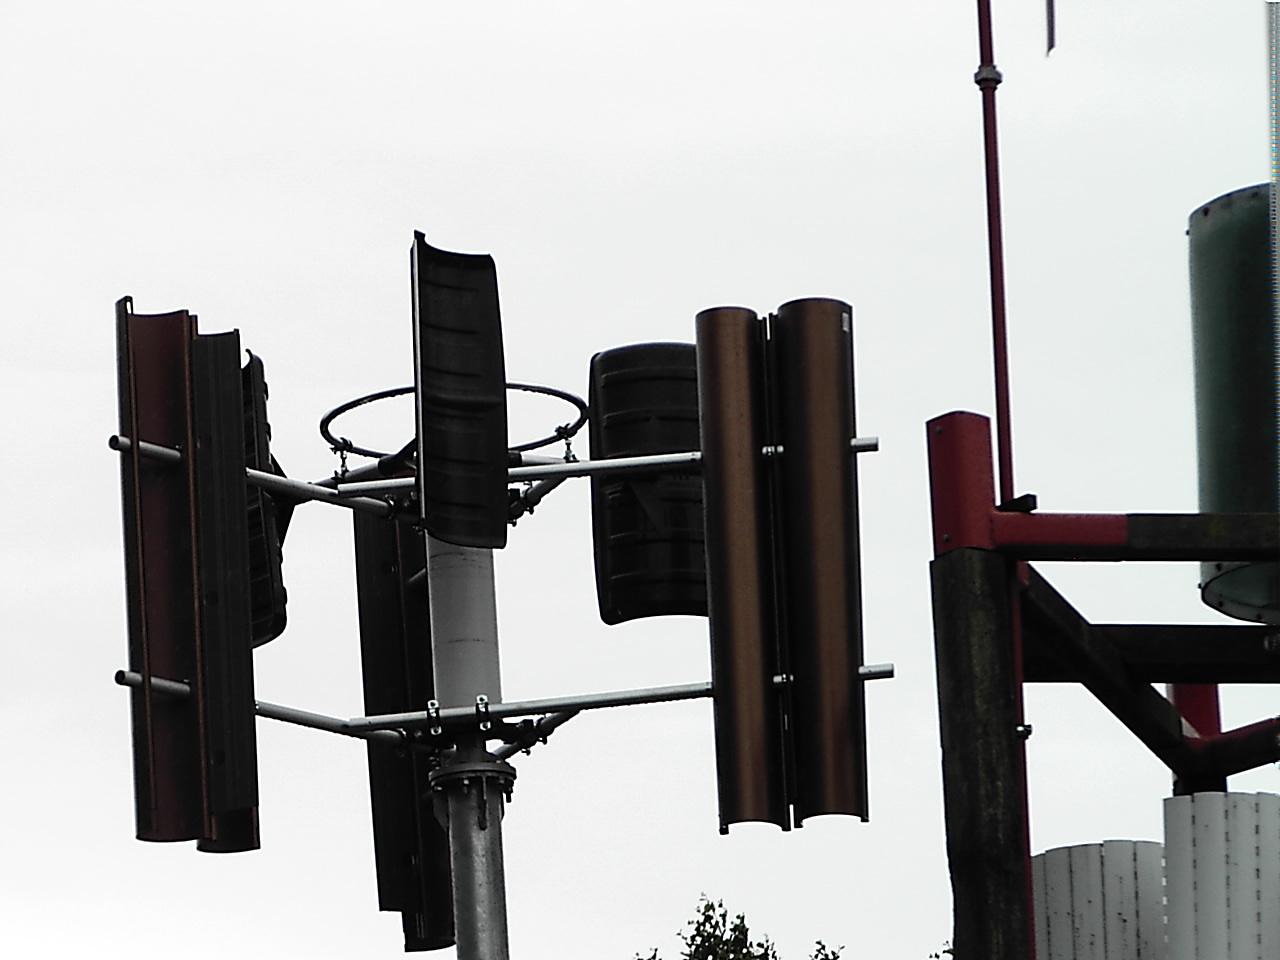 Vertikal Windanlagen Www Kleinwindanlagen De